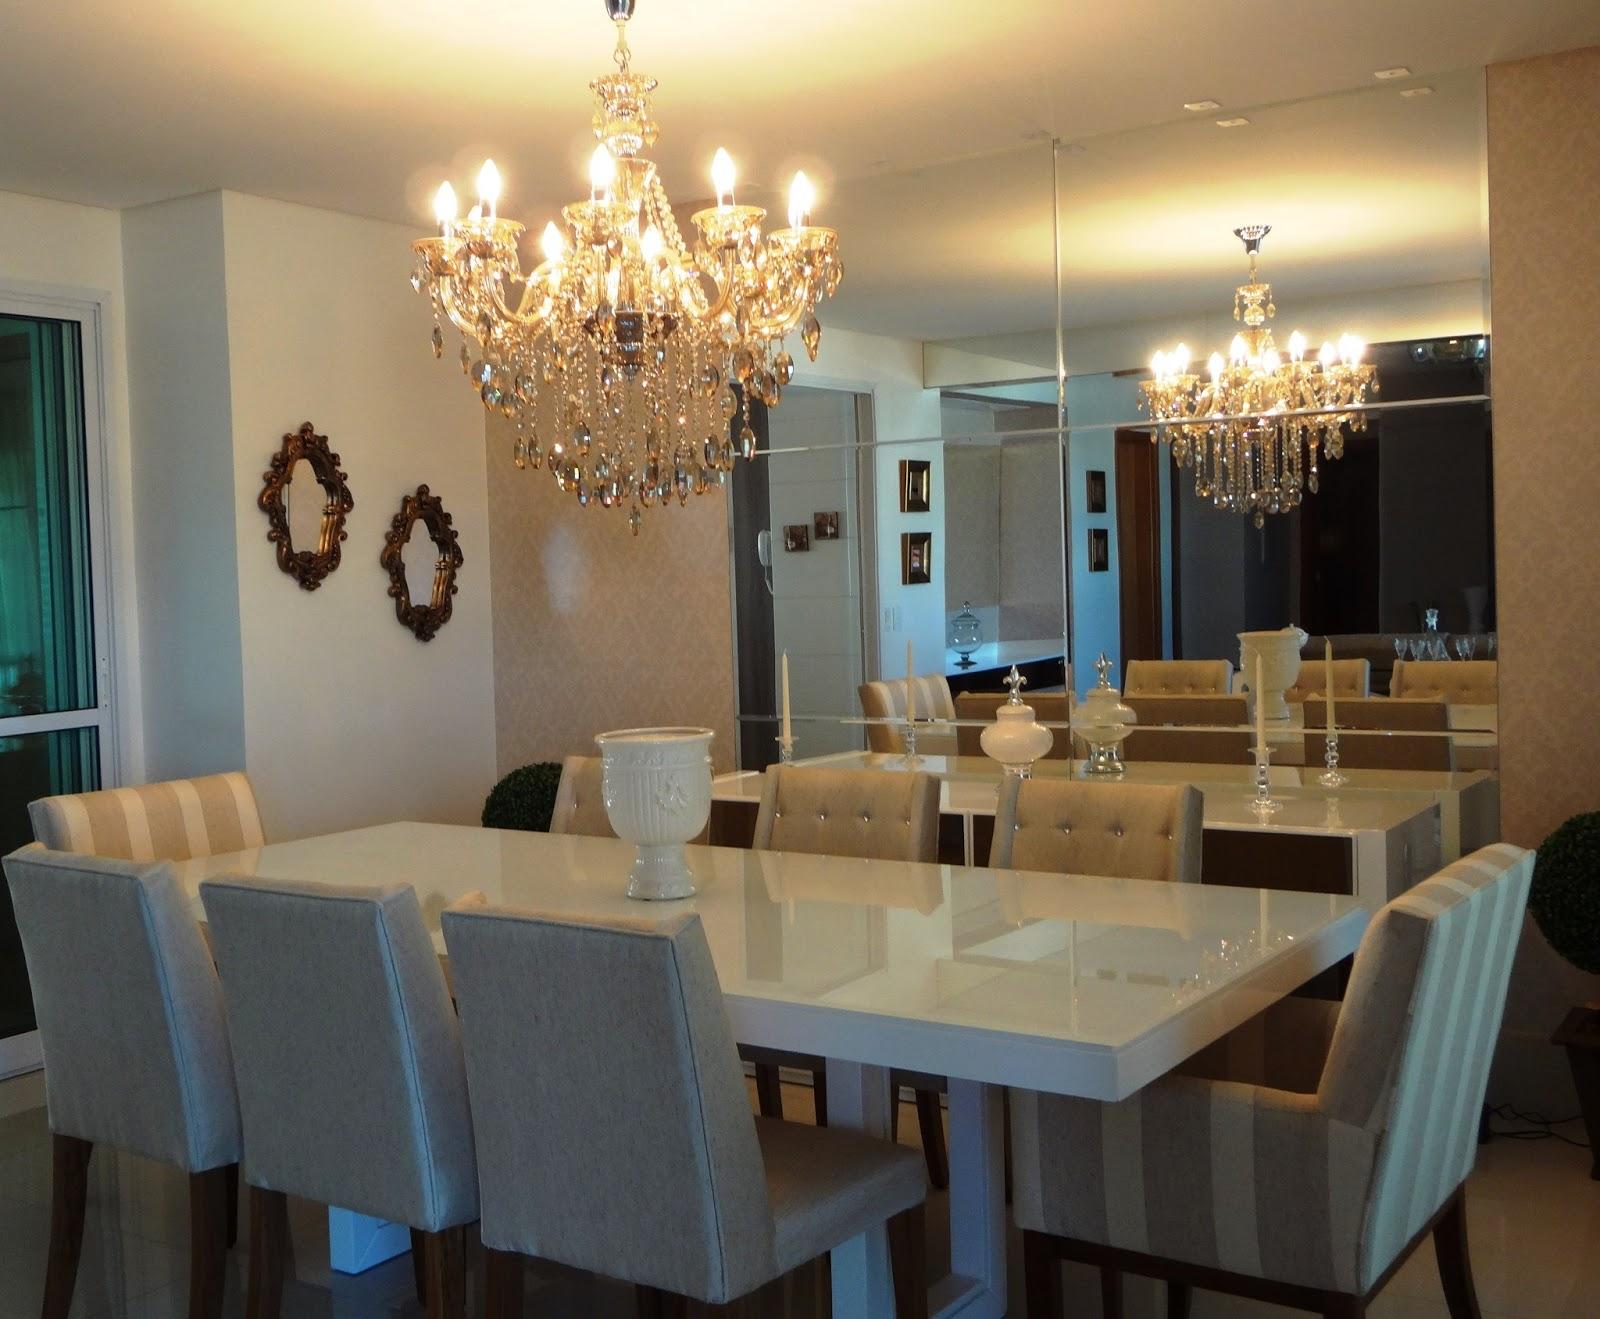 Buffet Sala De Jantar Venda ~  Casa Clean 21 Salas de Jantar dos Sonhos com Buffet ou Aparador